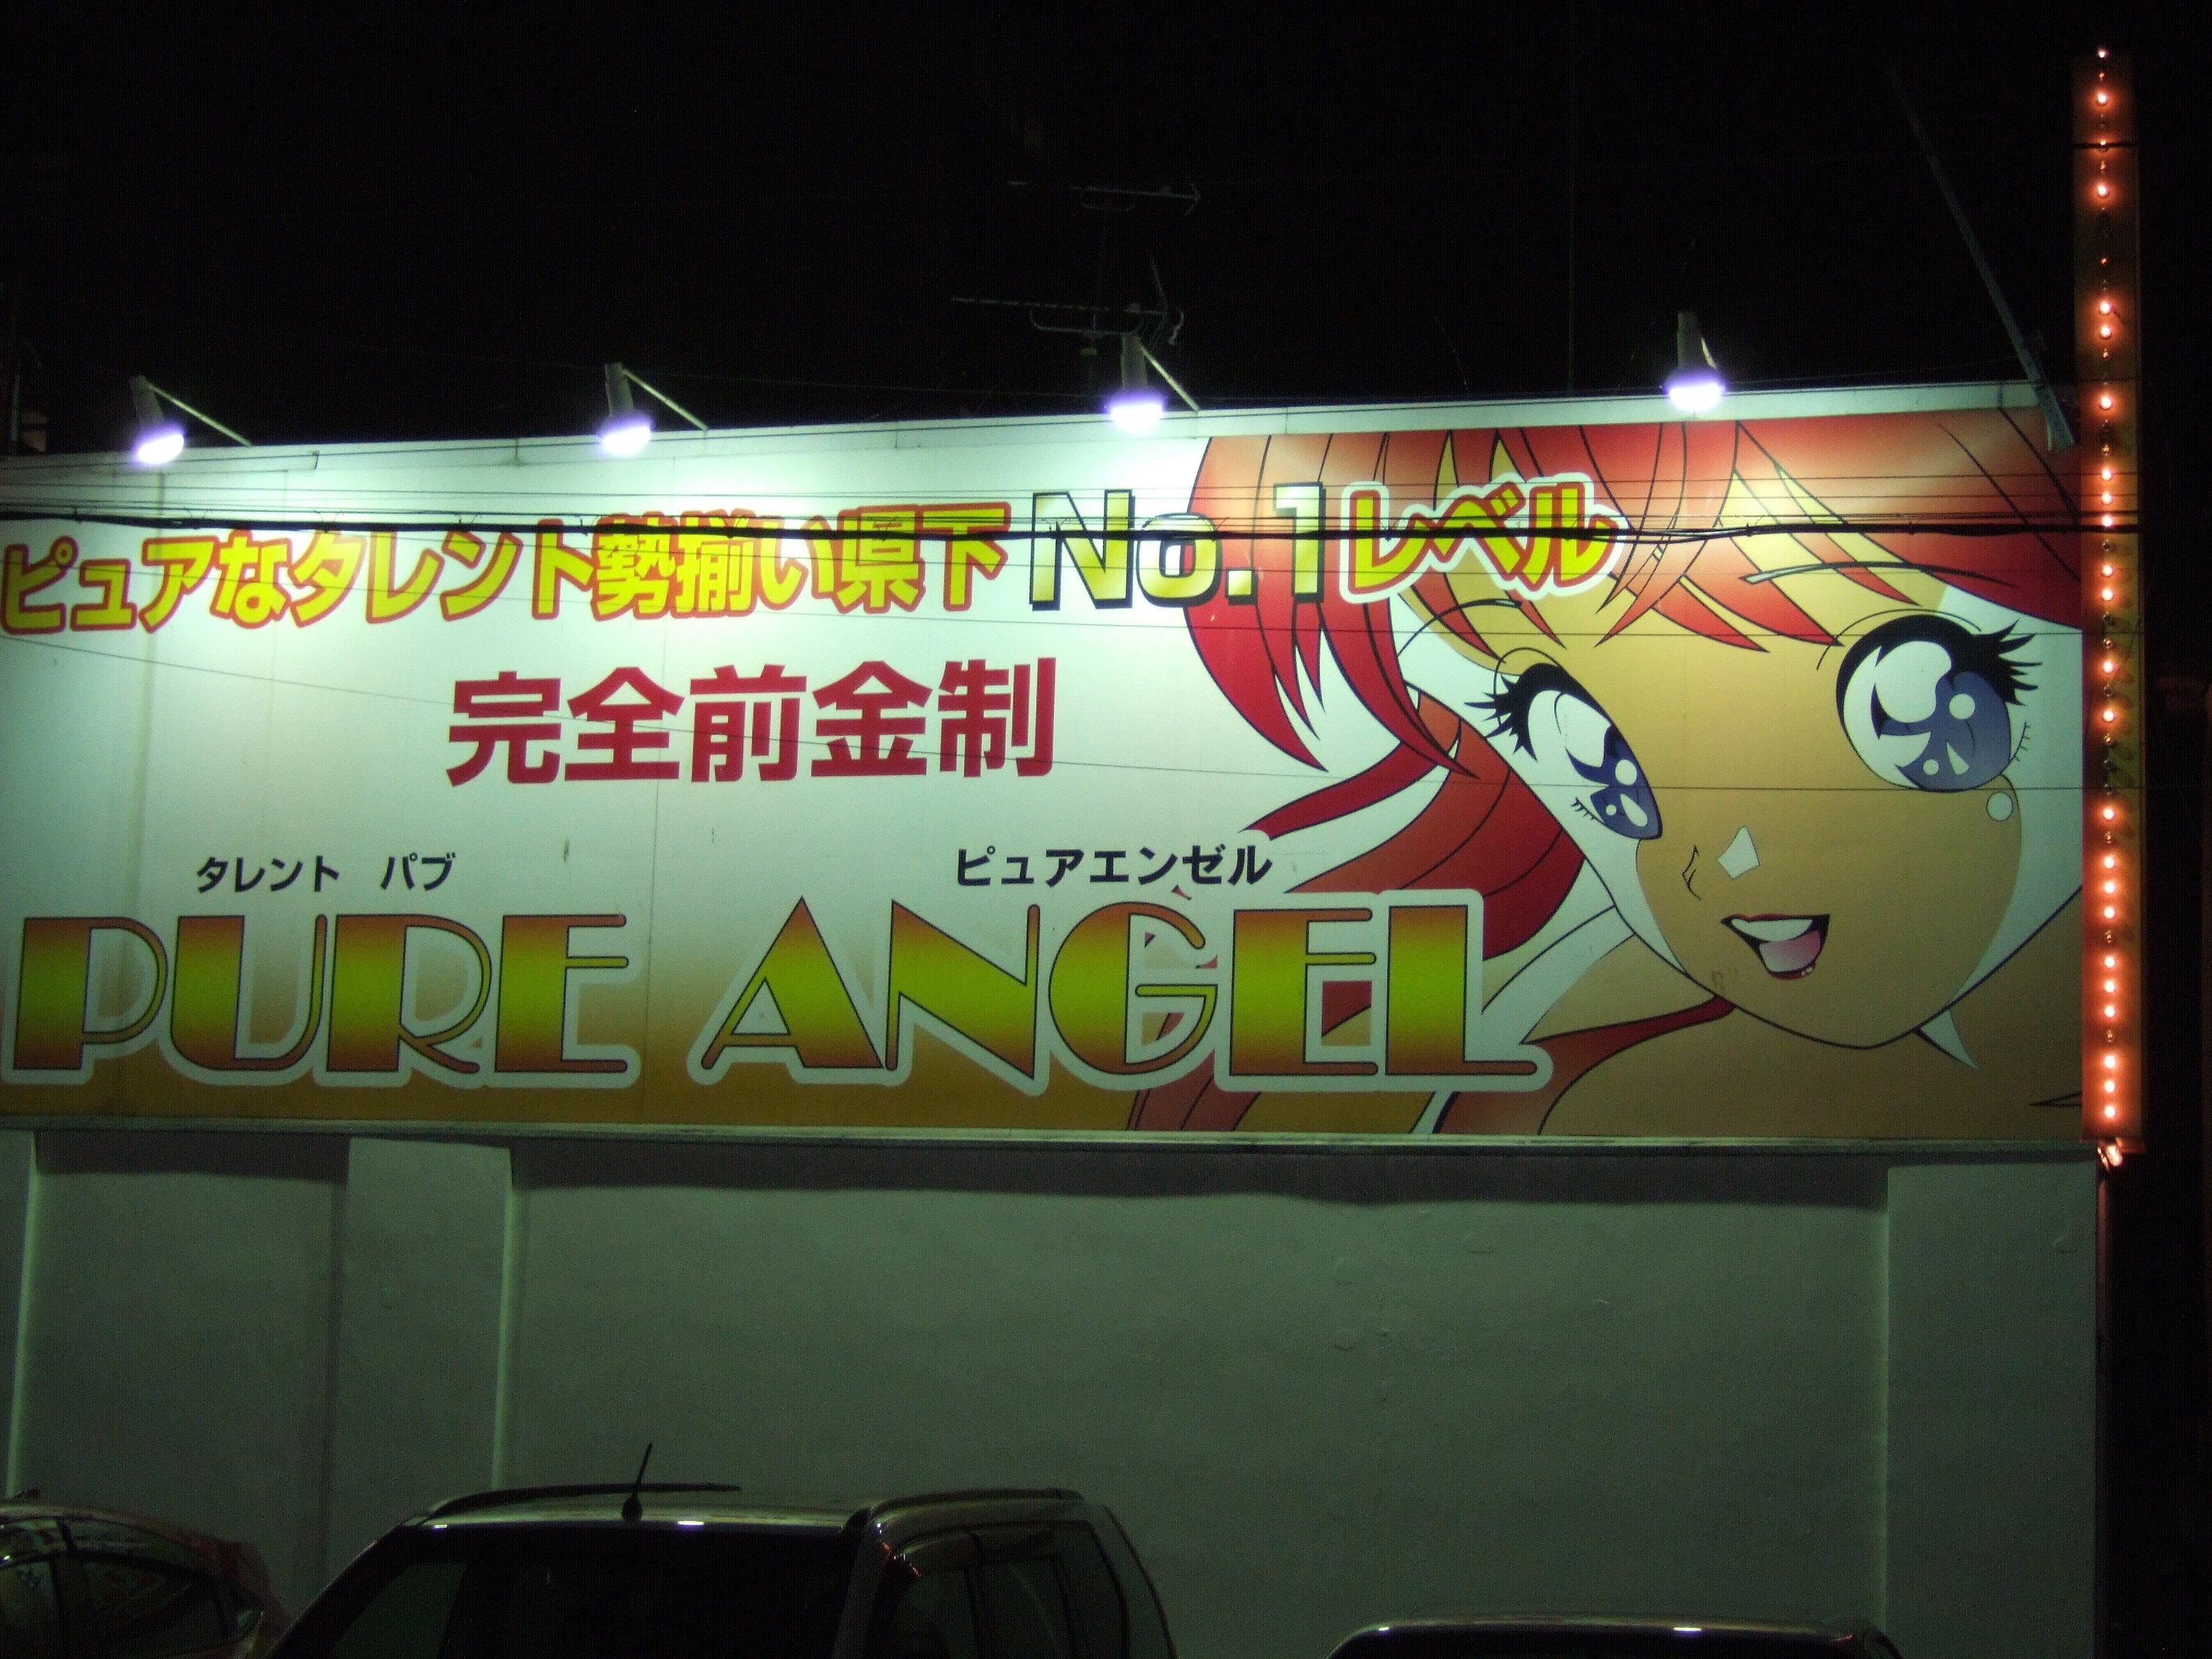 koriyama_pureengel.jpg